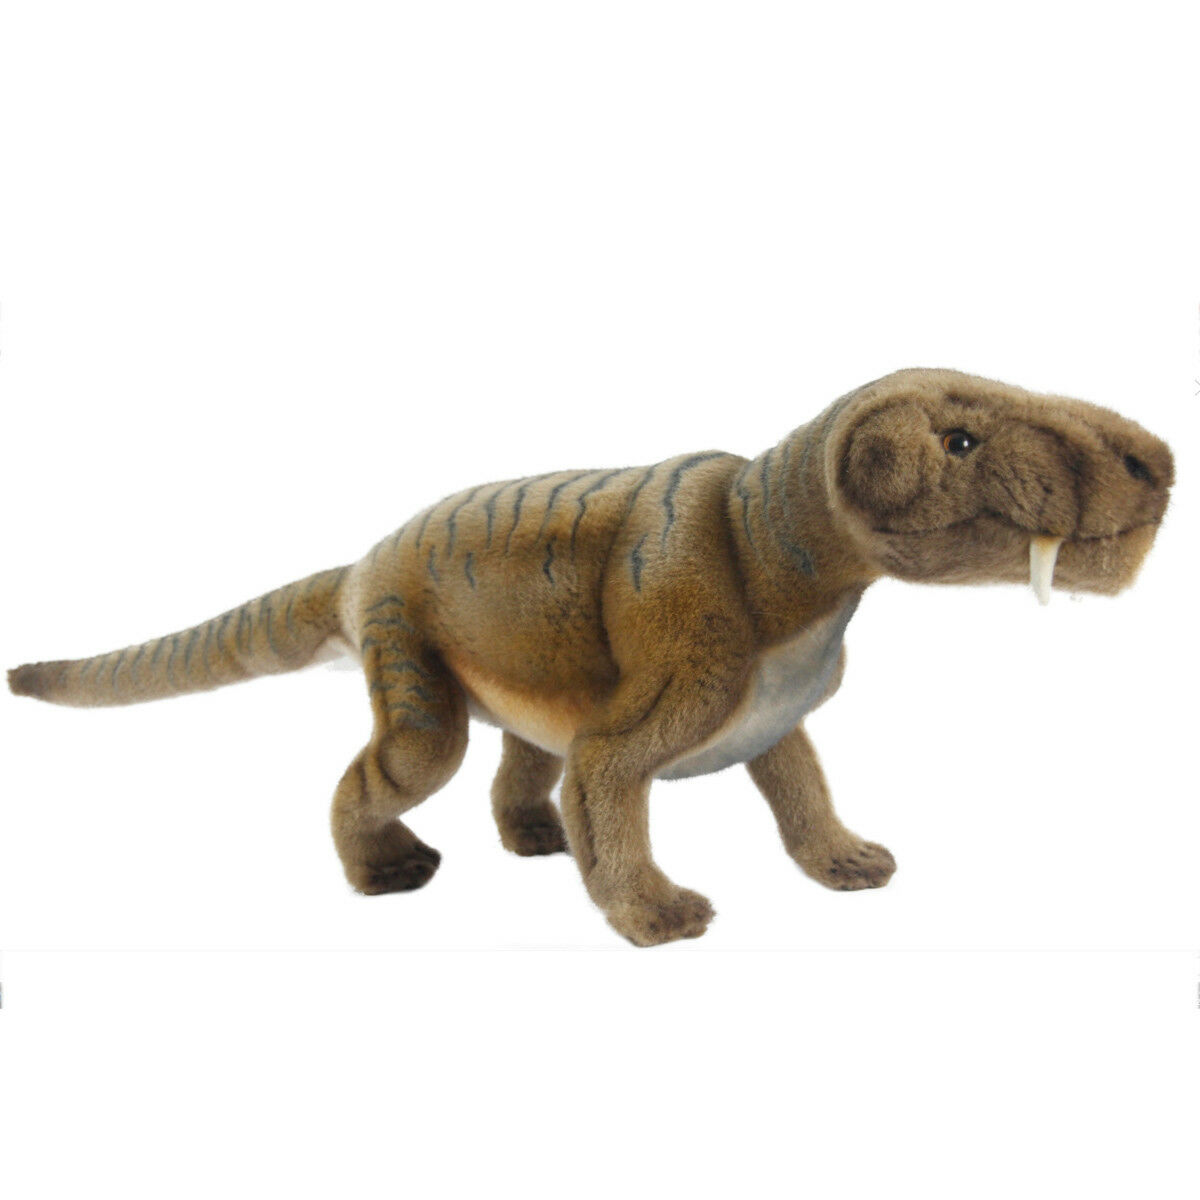 Inostrancevia Dinosaur Hansa Realistic Soft Animal Plush Toy 45cm FREE DELIVERY